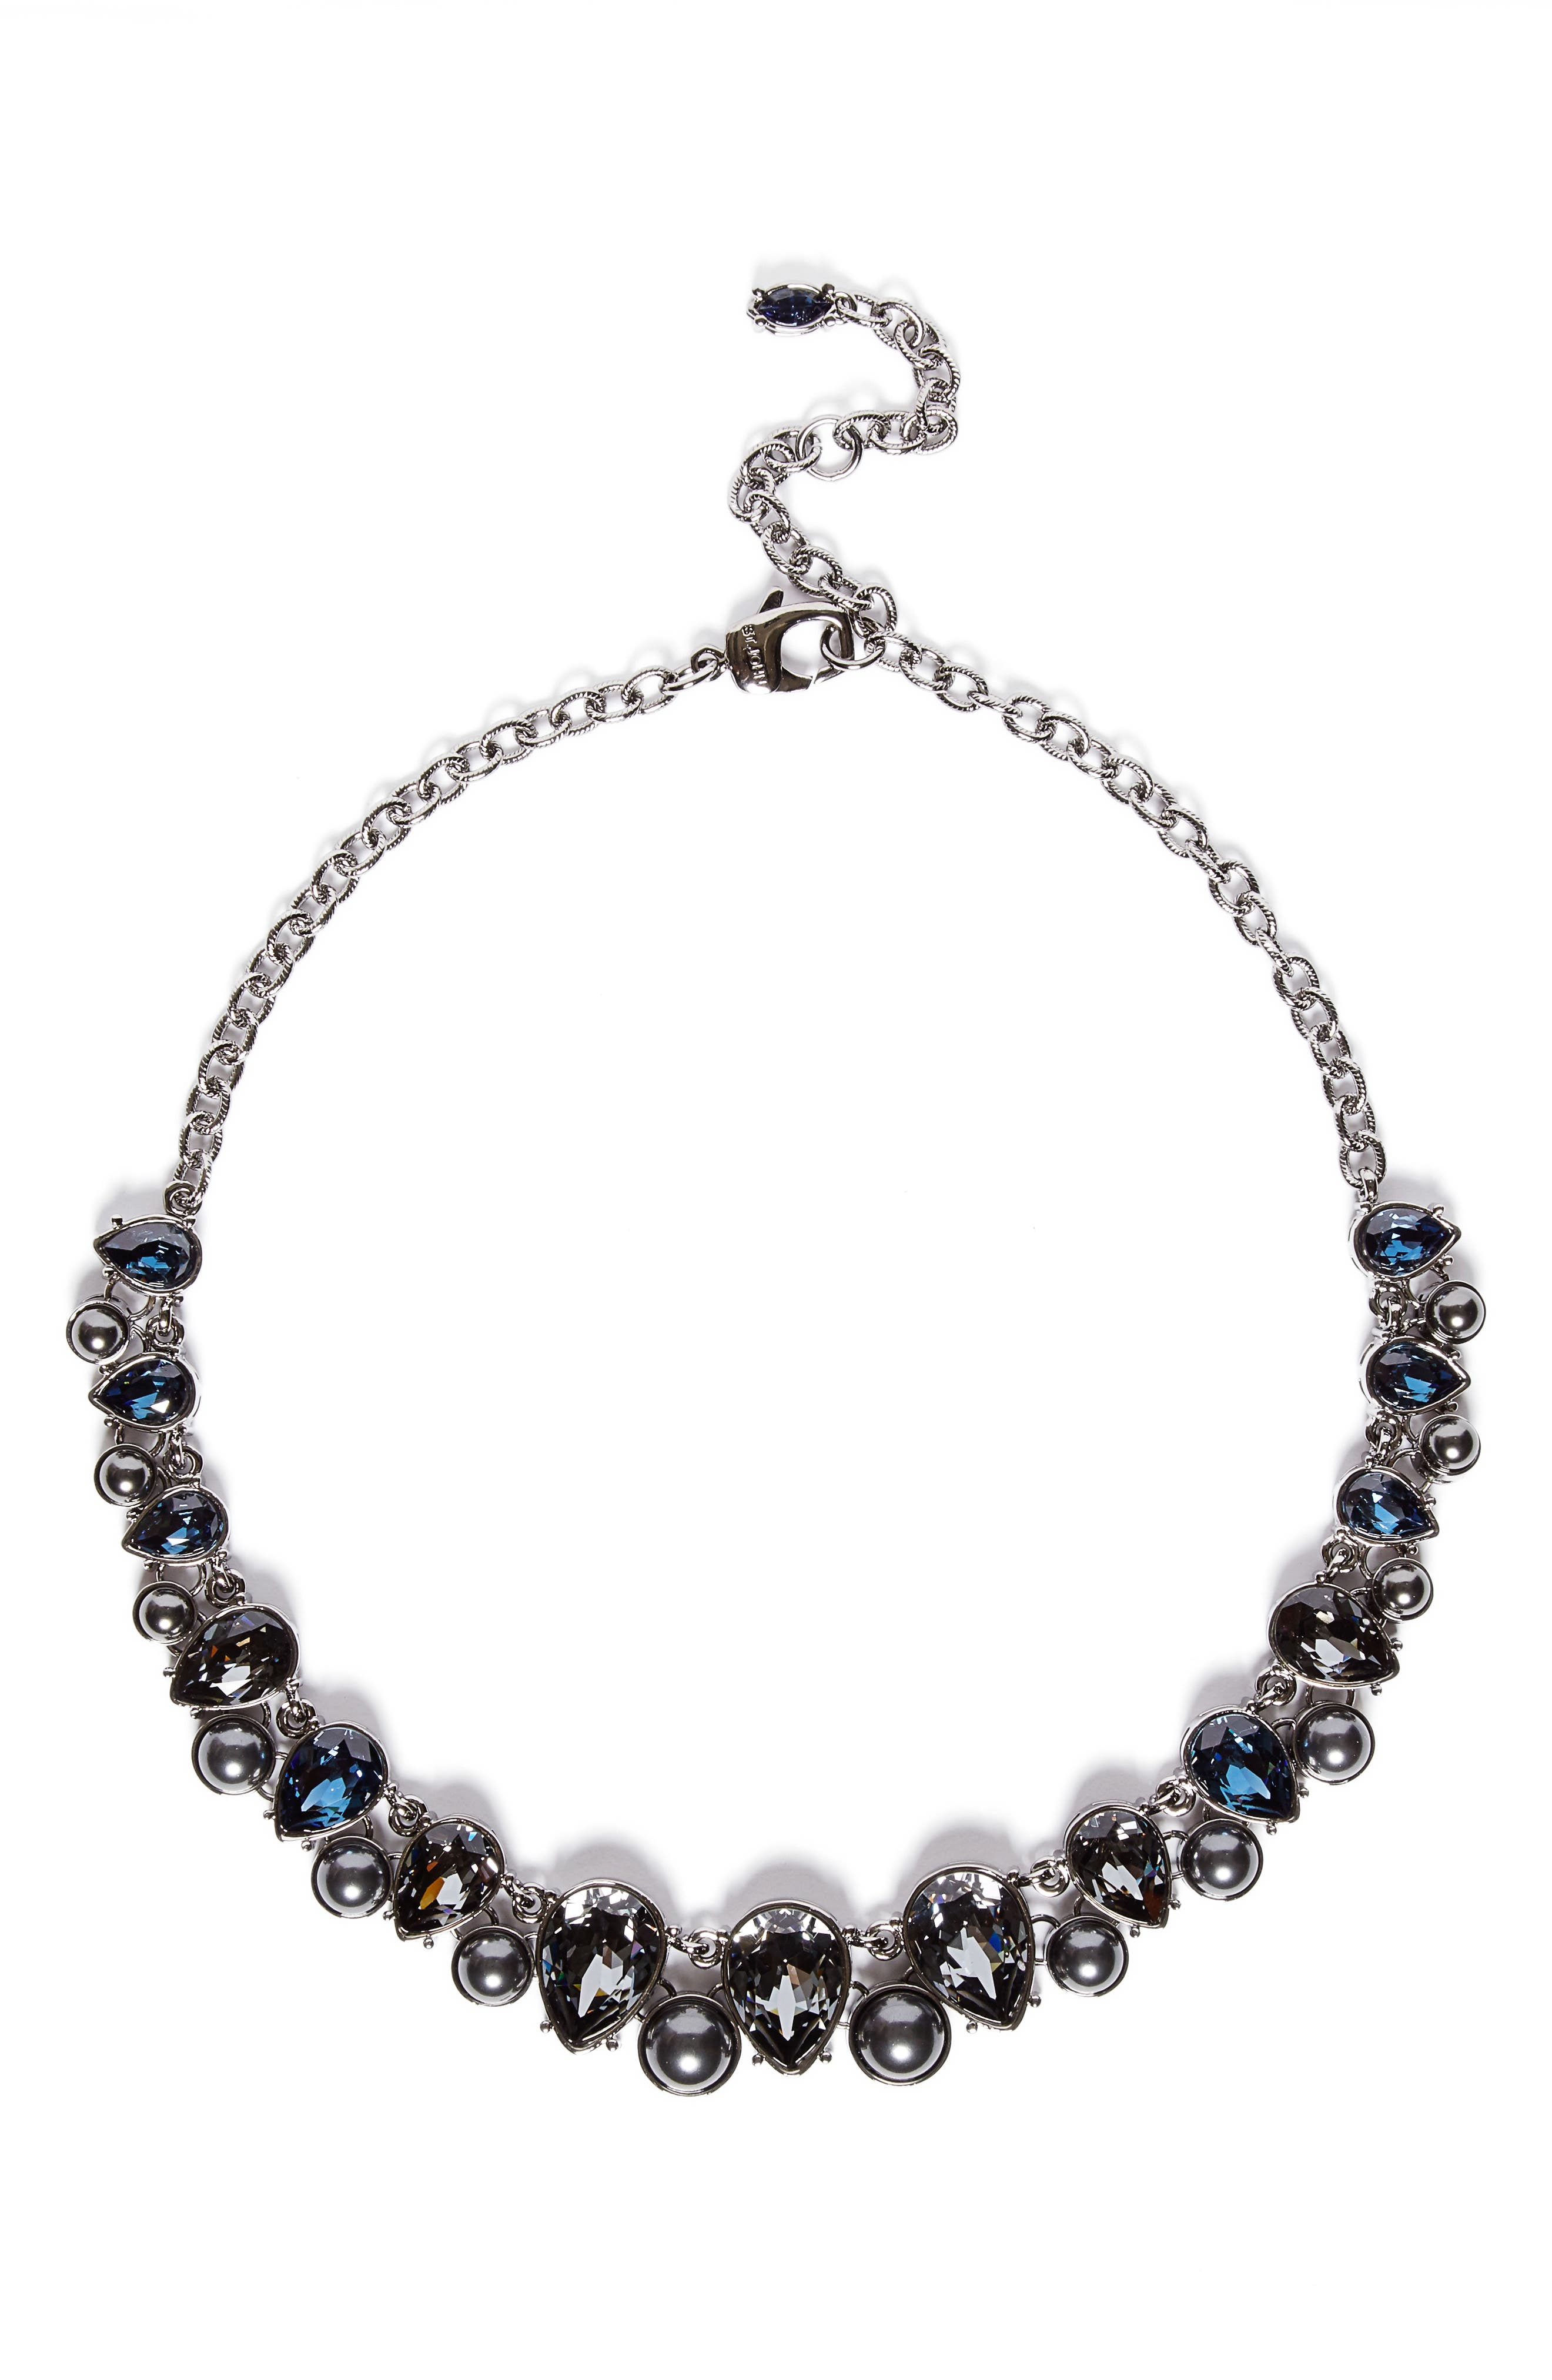 Swarovski Crystal & Imitation Pearl Necklace,                             Main thumbnail 1, color,                             040